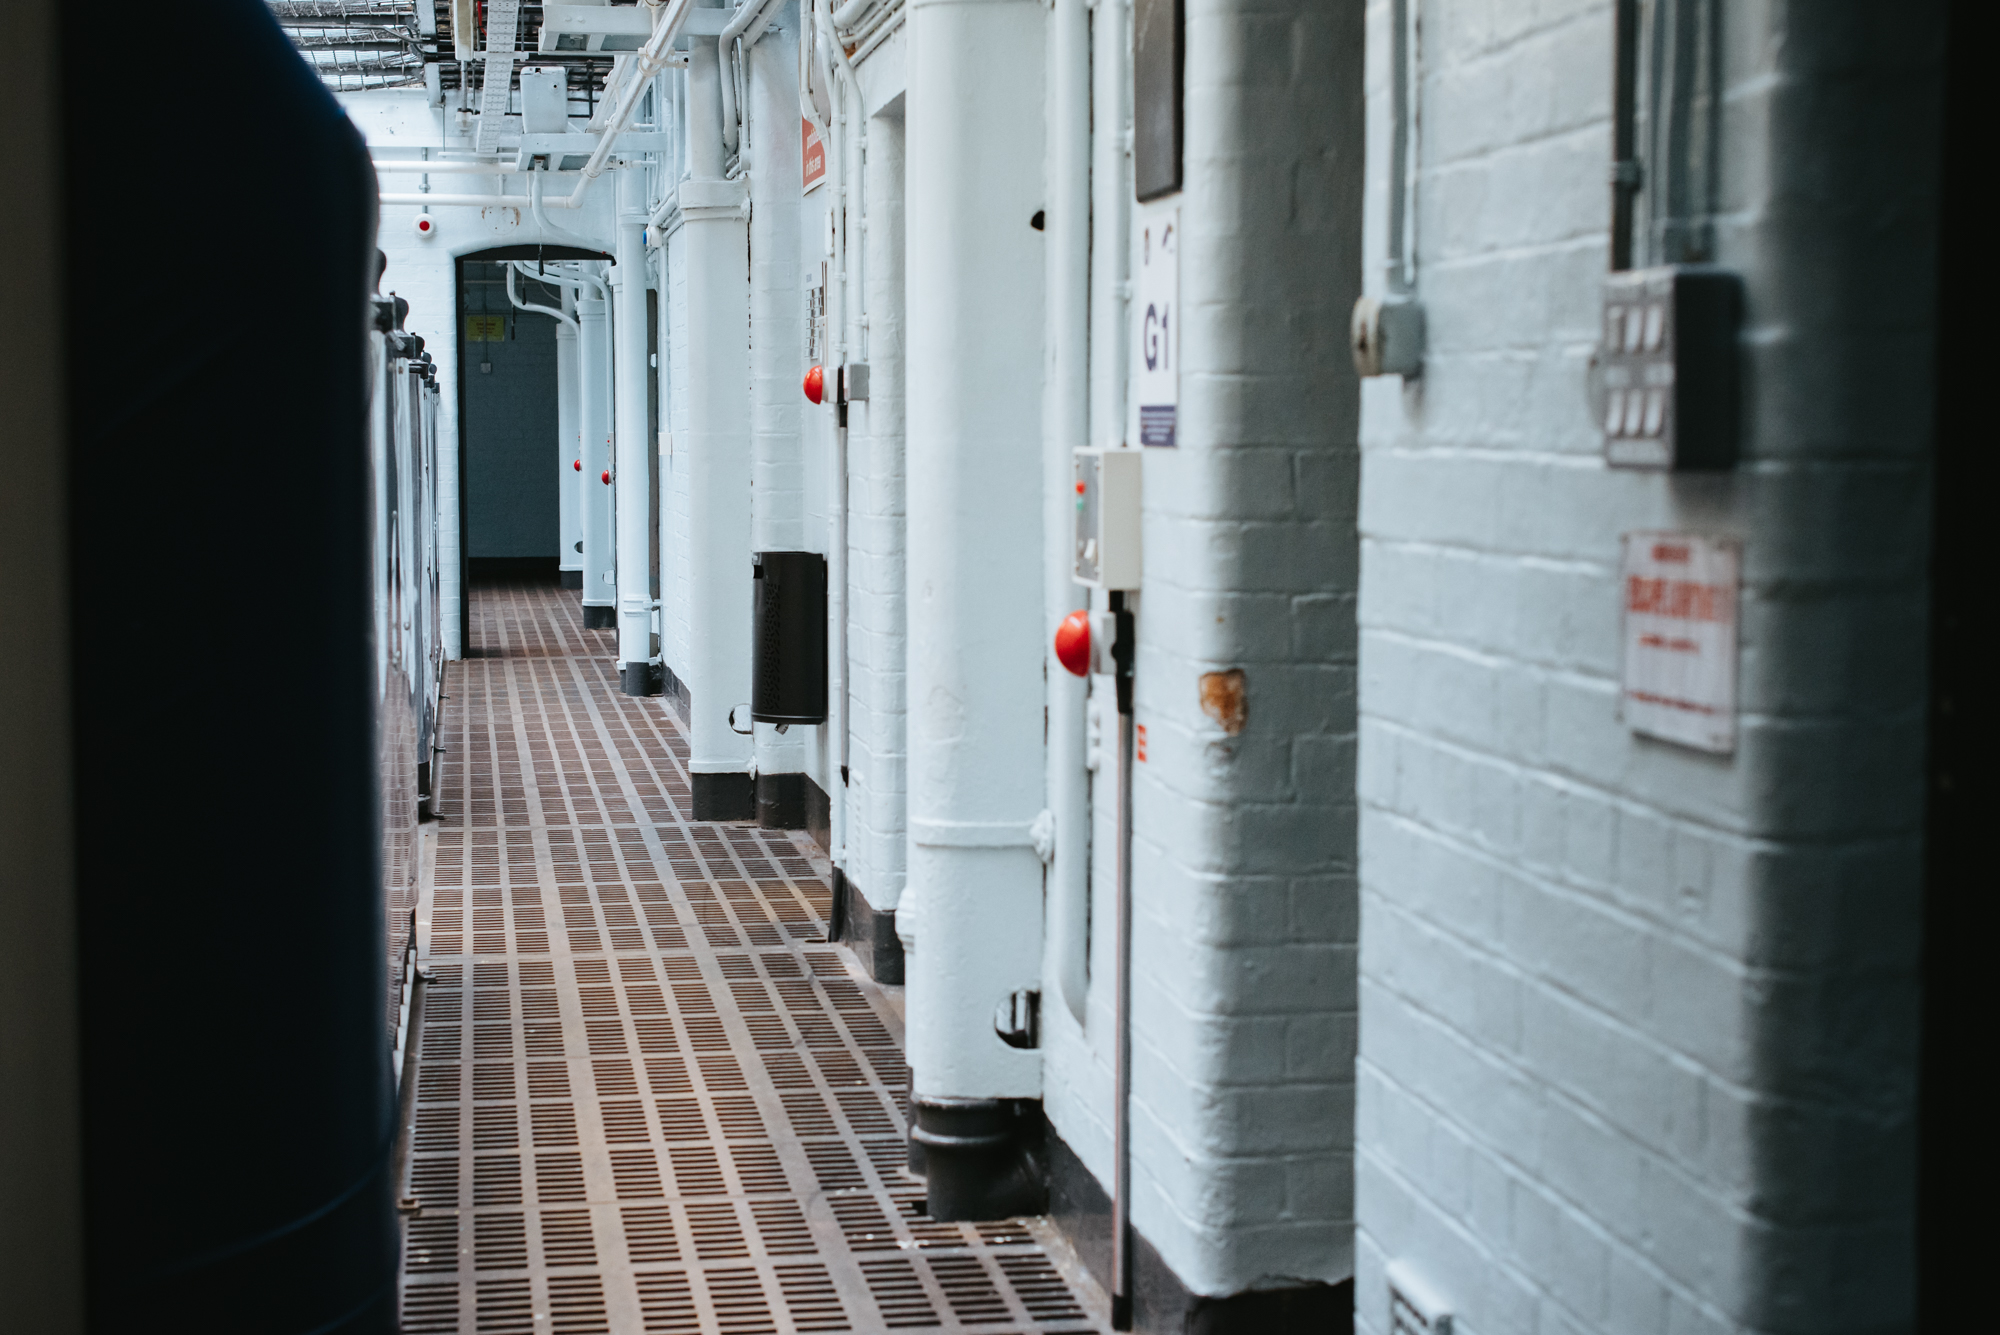 Steelhouse-Lane-Lock-Up-Birmingham-Hanny-Foxhall-_DSC1099.jpg